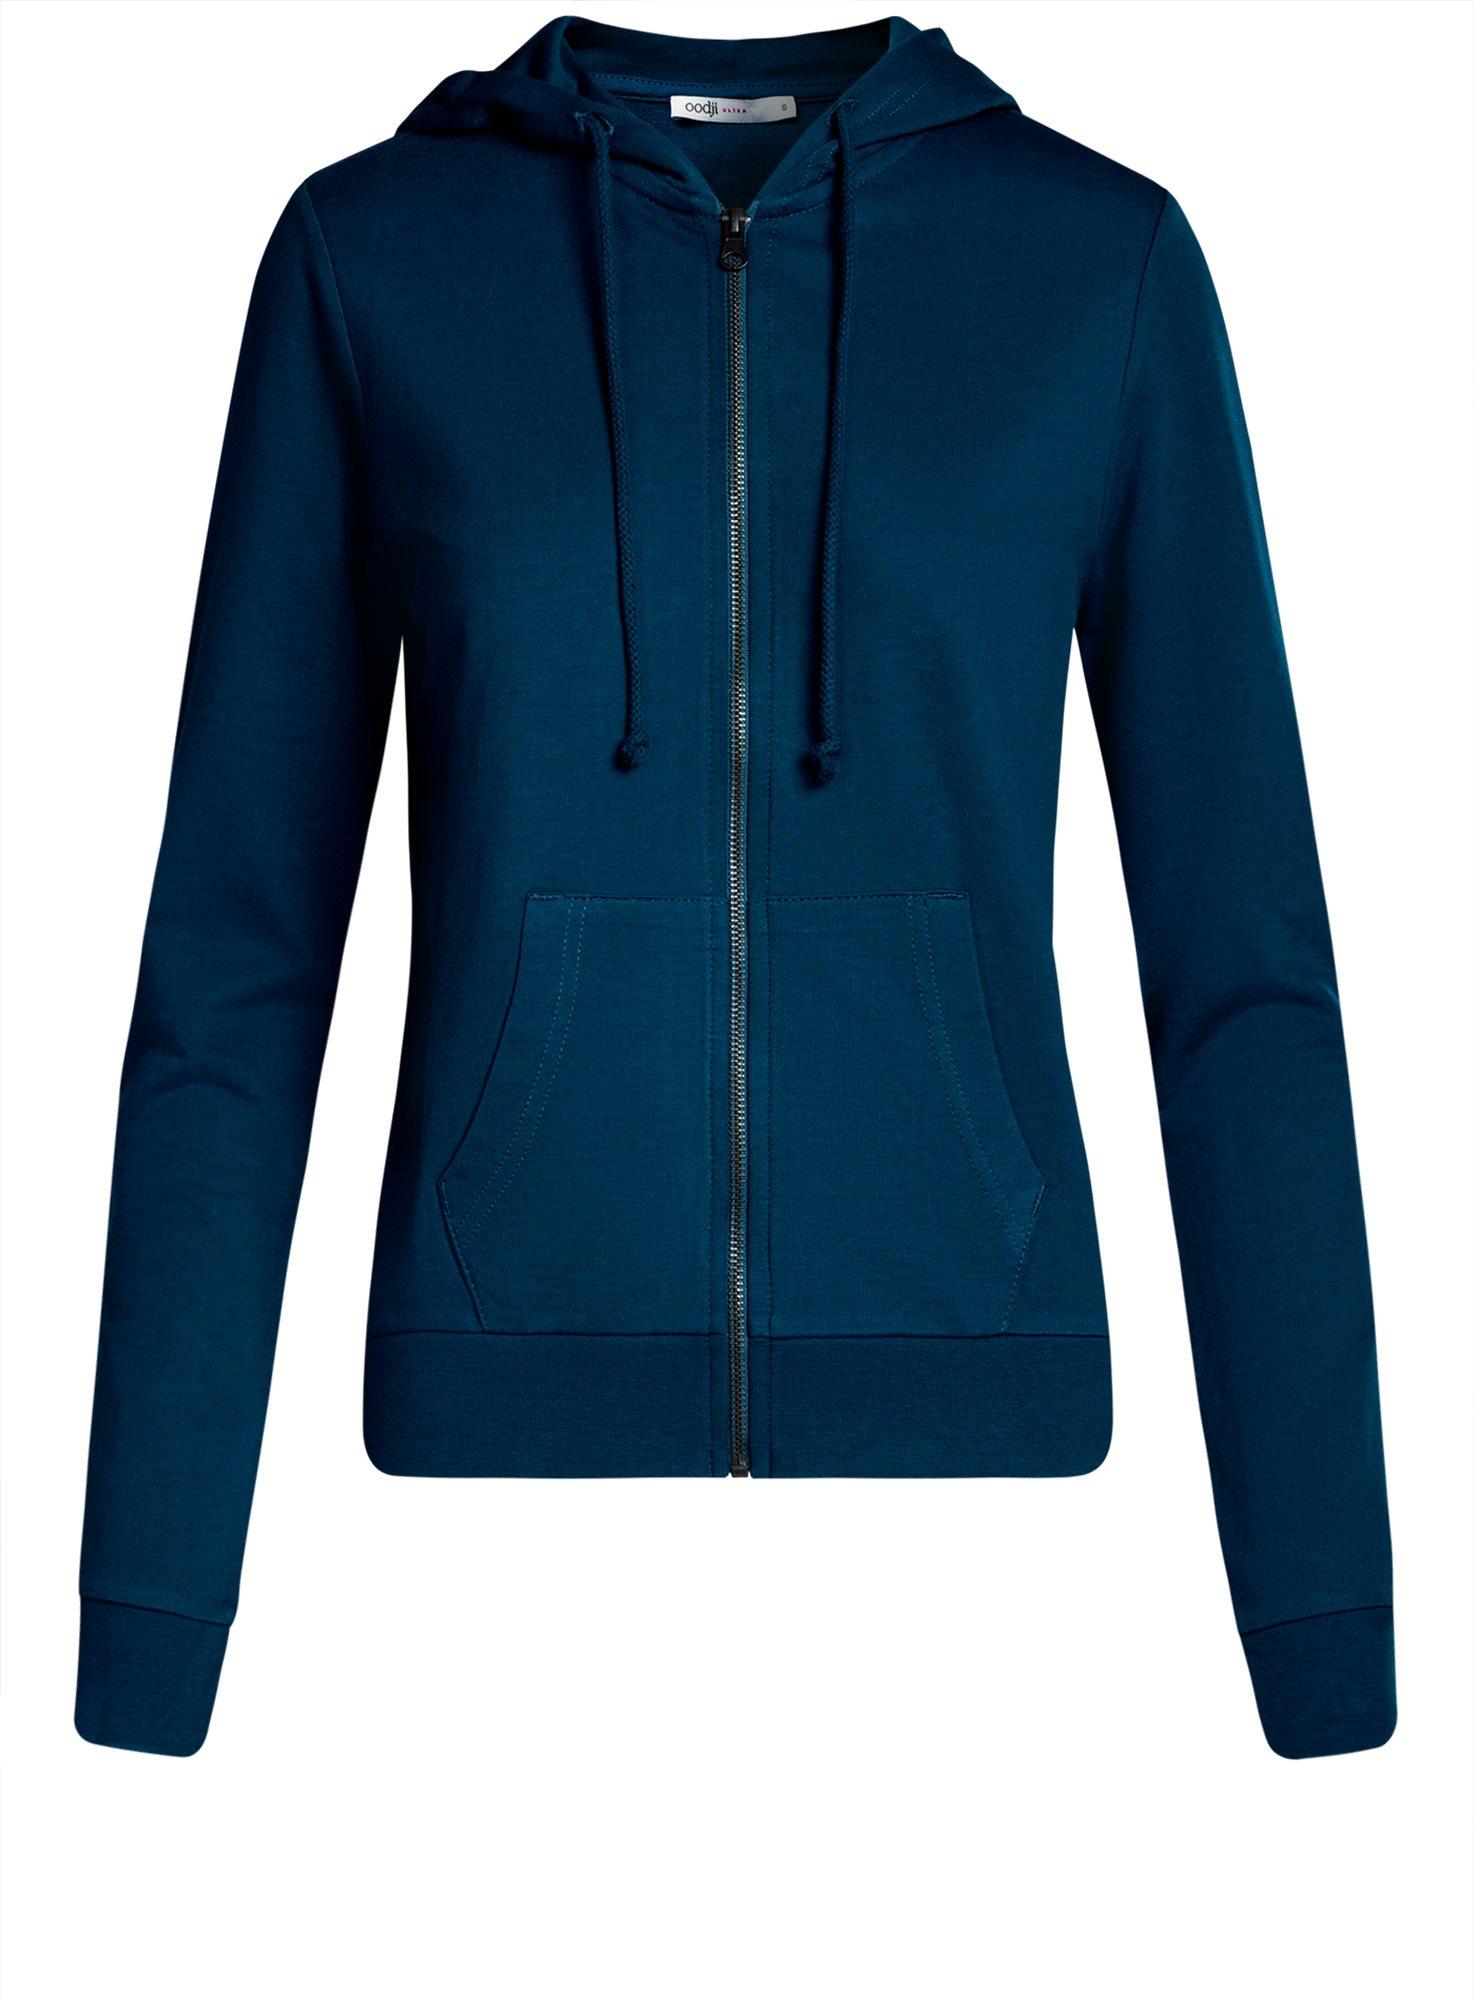 Толстовка с капюшоном и карманами oodji для женщины (синий), 16901079-2B/46934/7900N